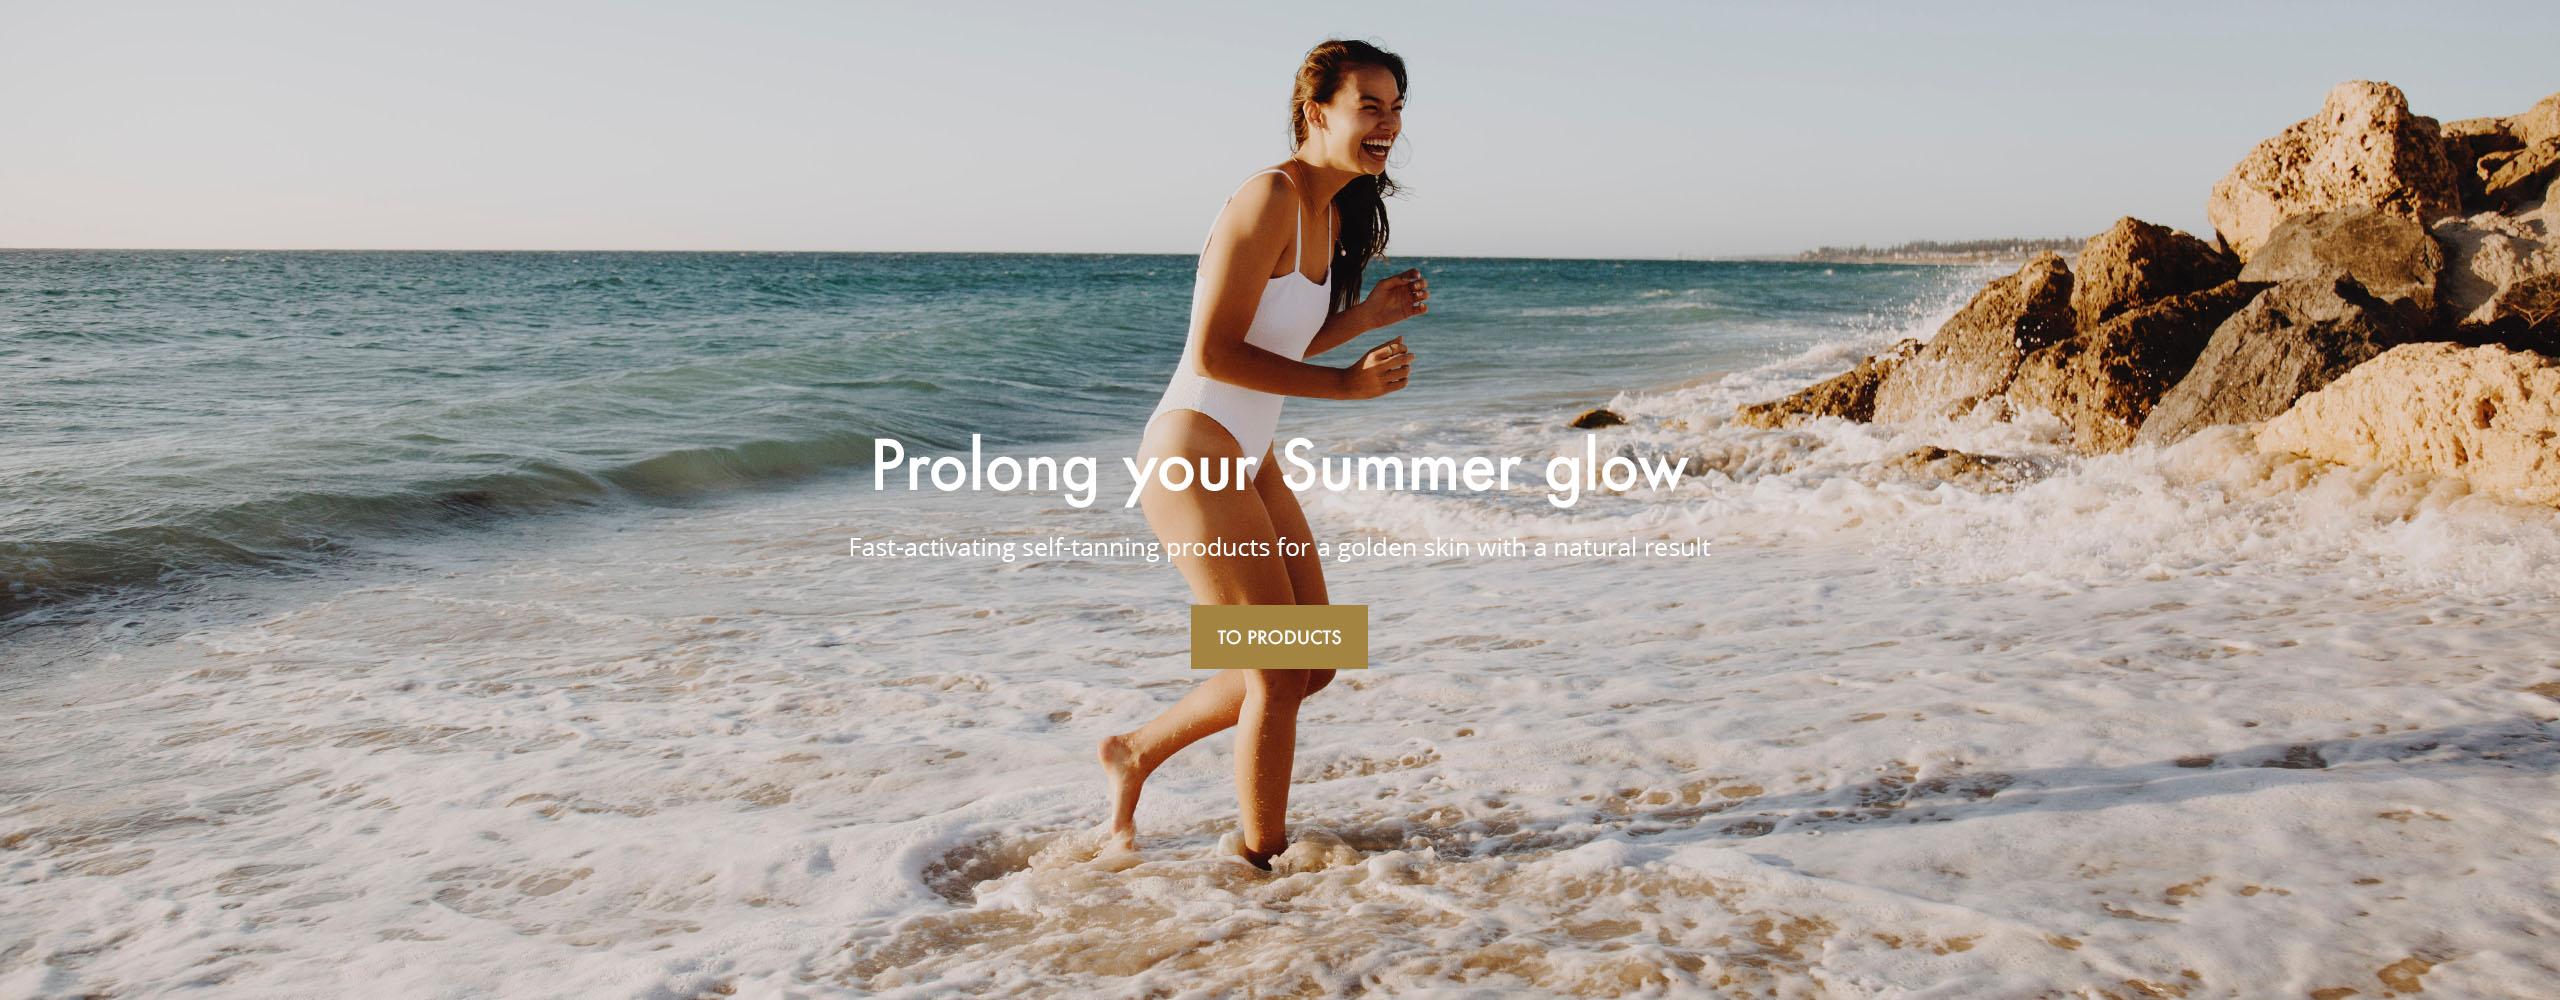 https://www.bronza.uk/image/888/Header-eng-prolong-your-glow-bronza_bronzing-mousse2.jpg